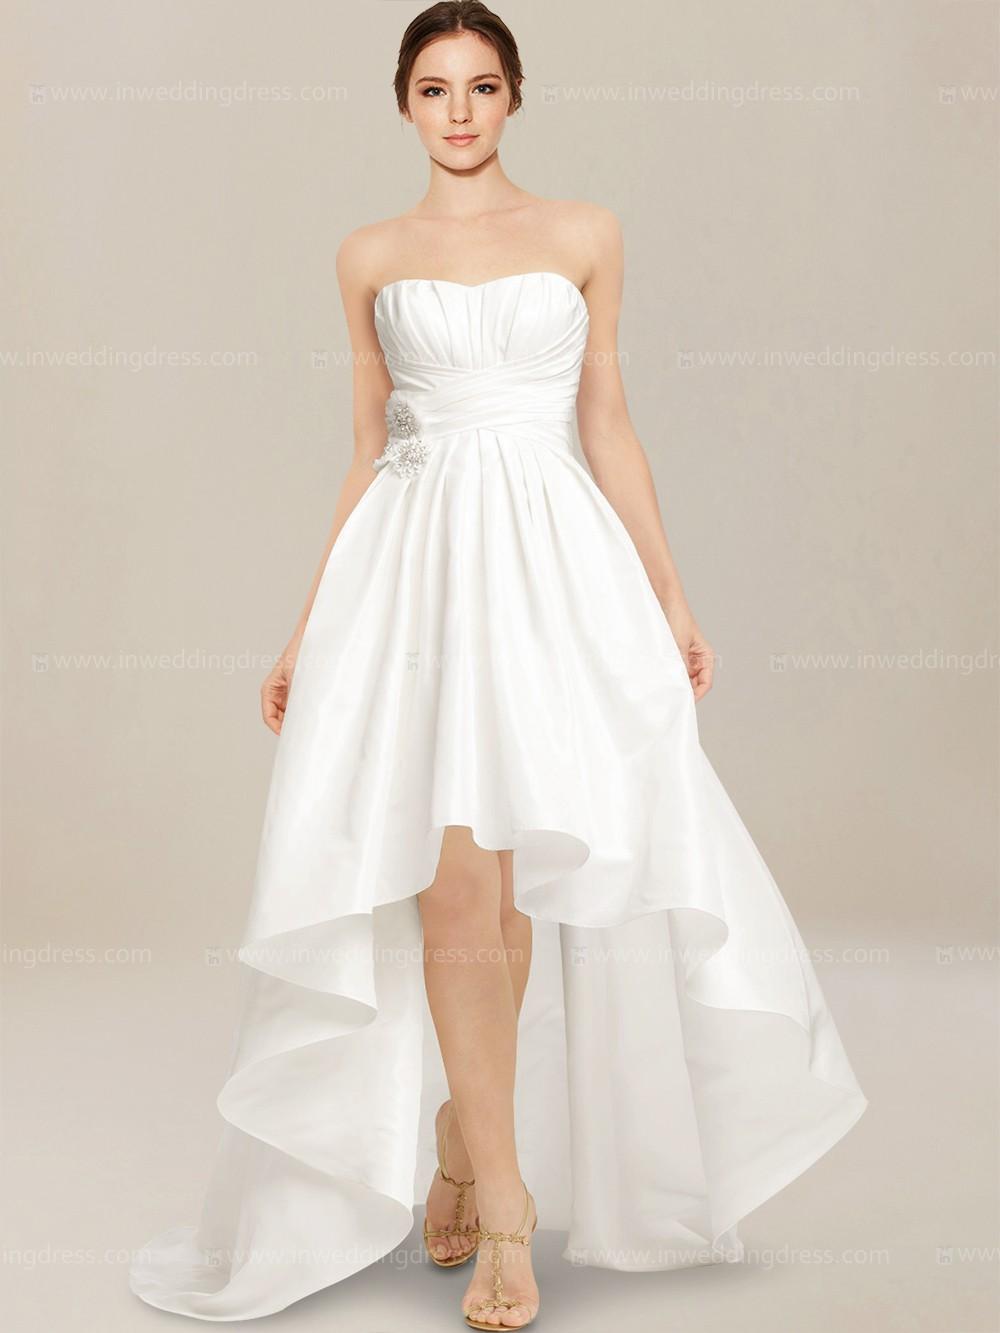 white high low wedding dresses photo - 1